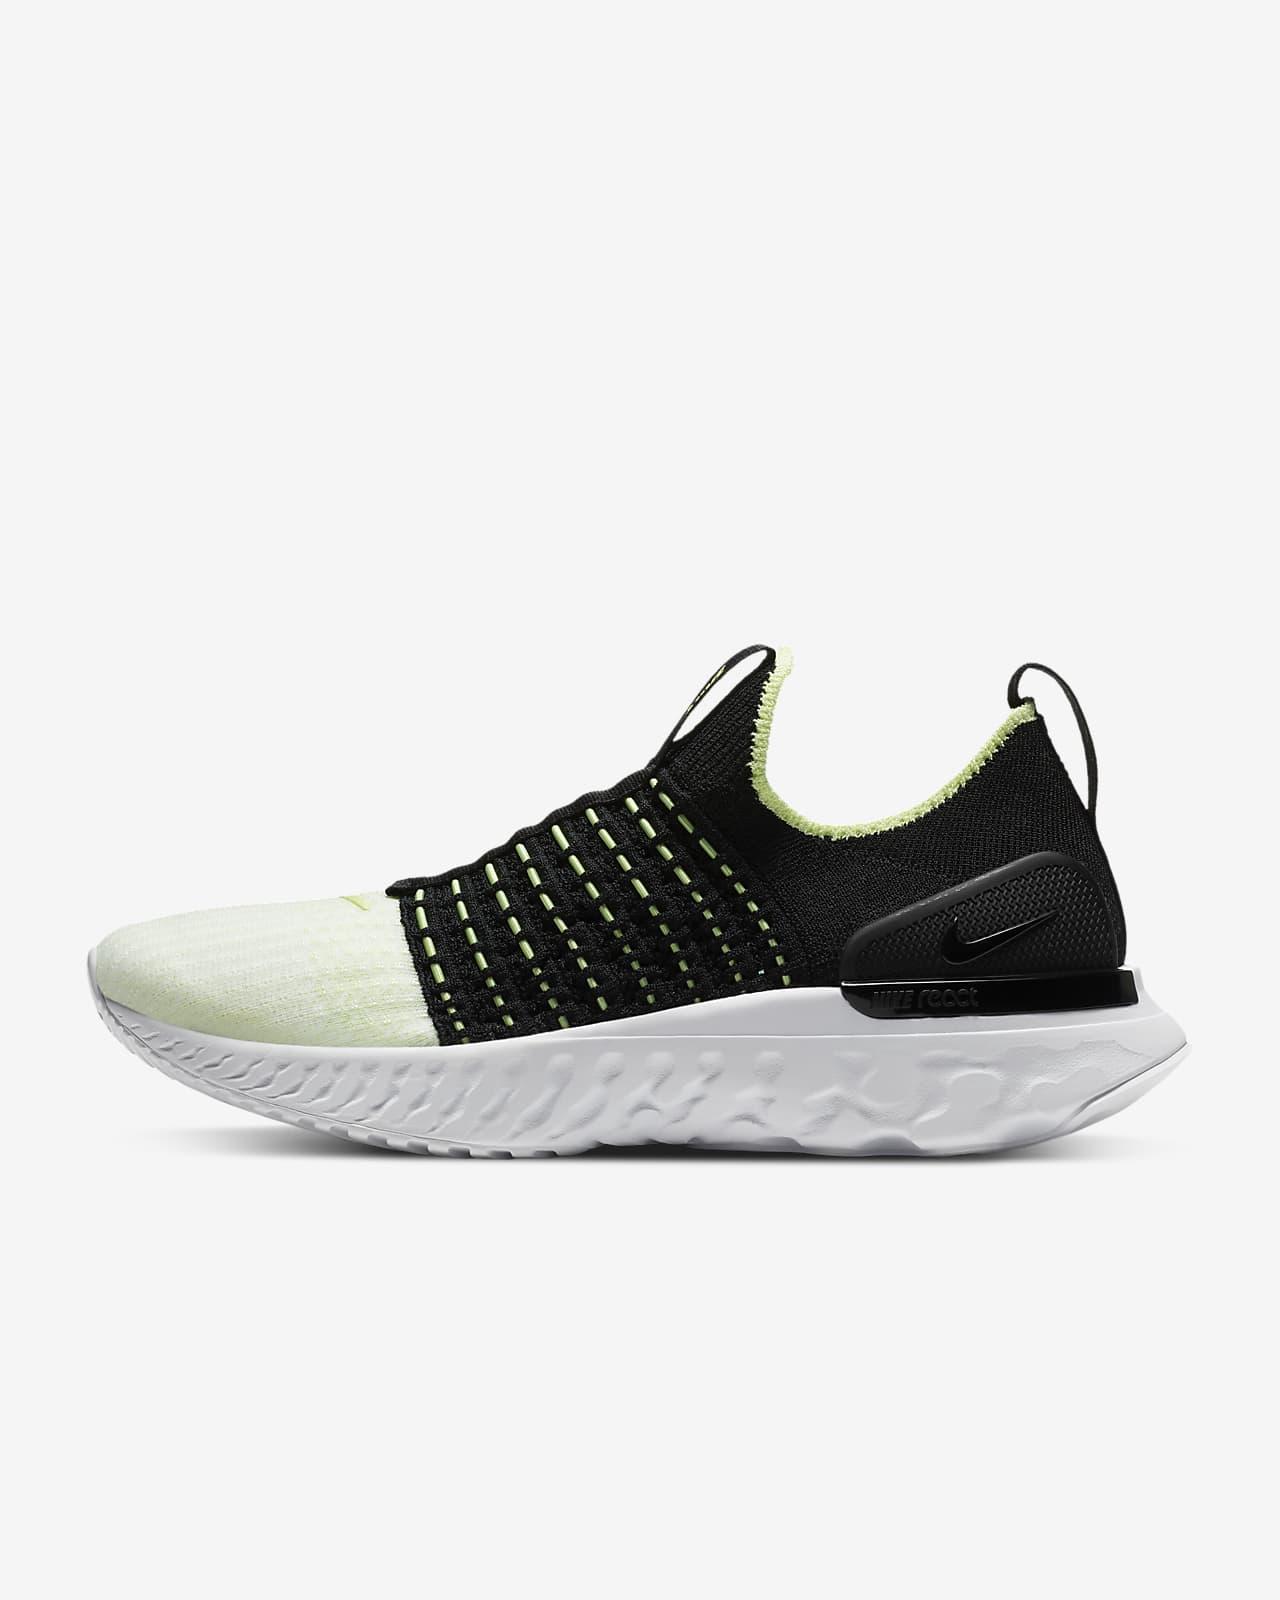 Calzado de running para mujer Nike React Phantom Run Flyknit 2